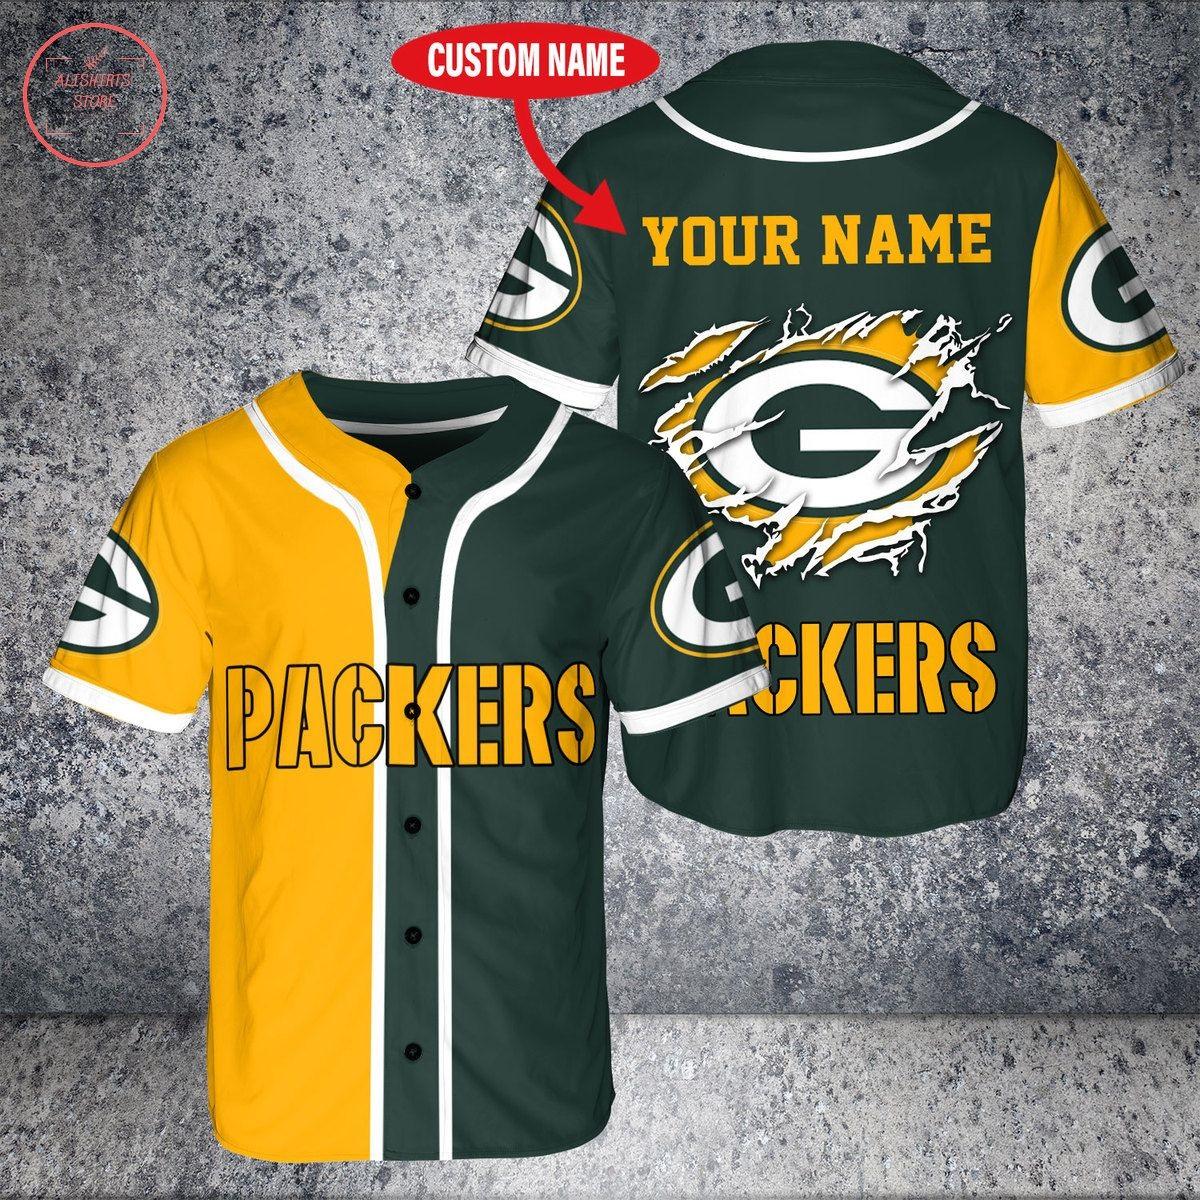 Custom Name NFL Green Bay Packers Baseball Jersey